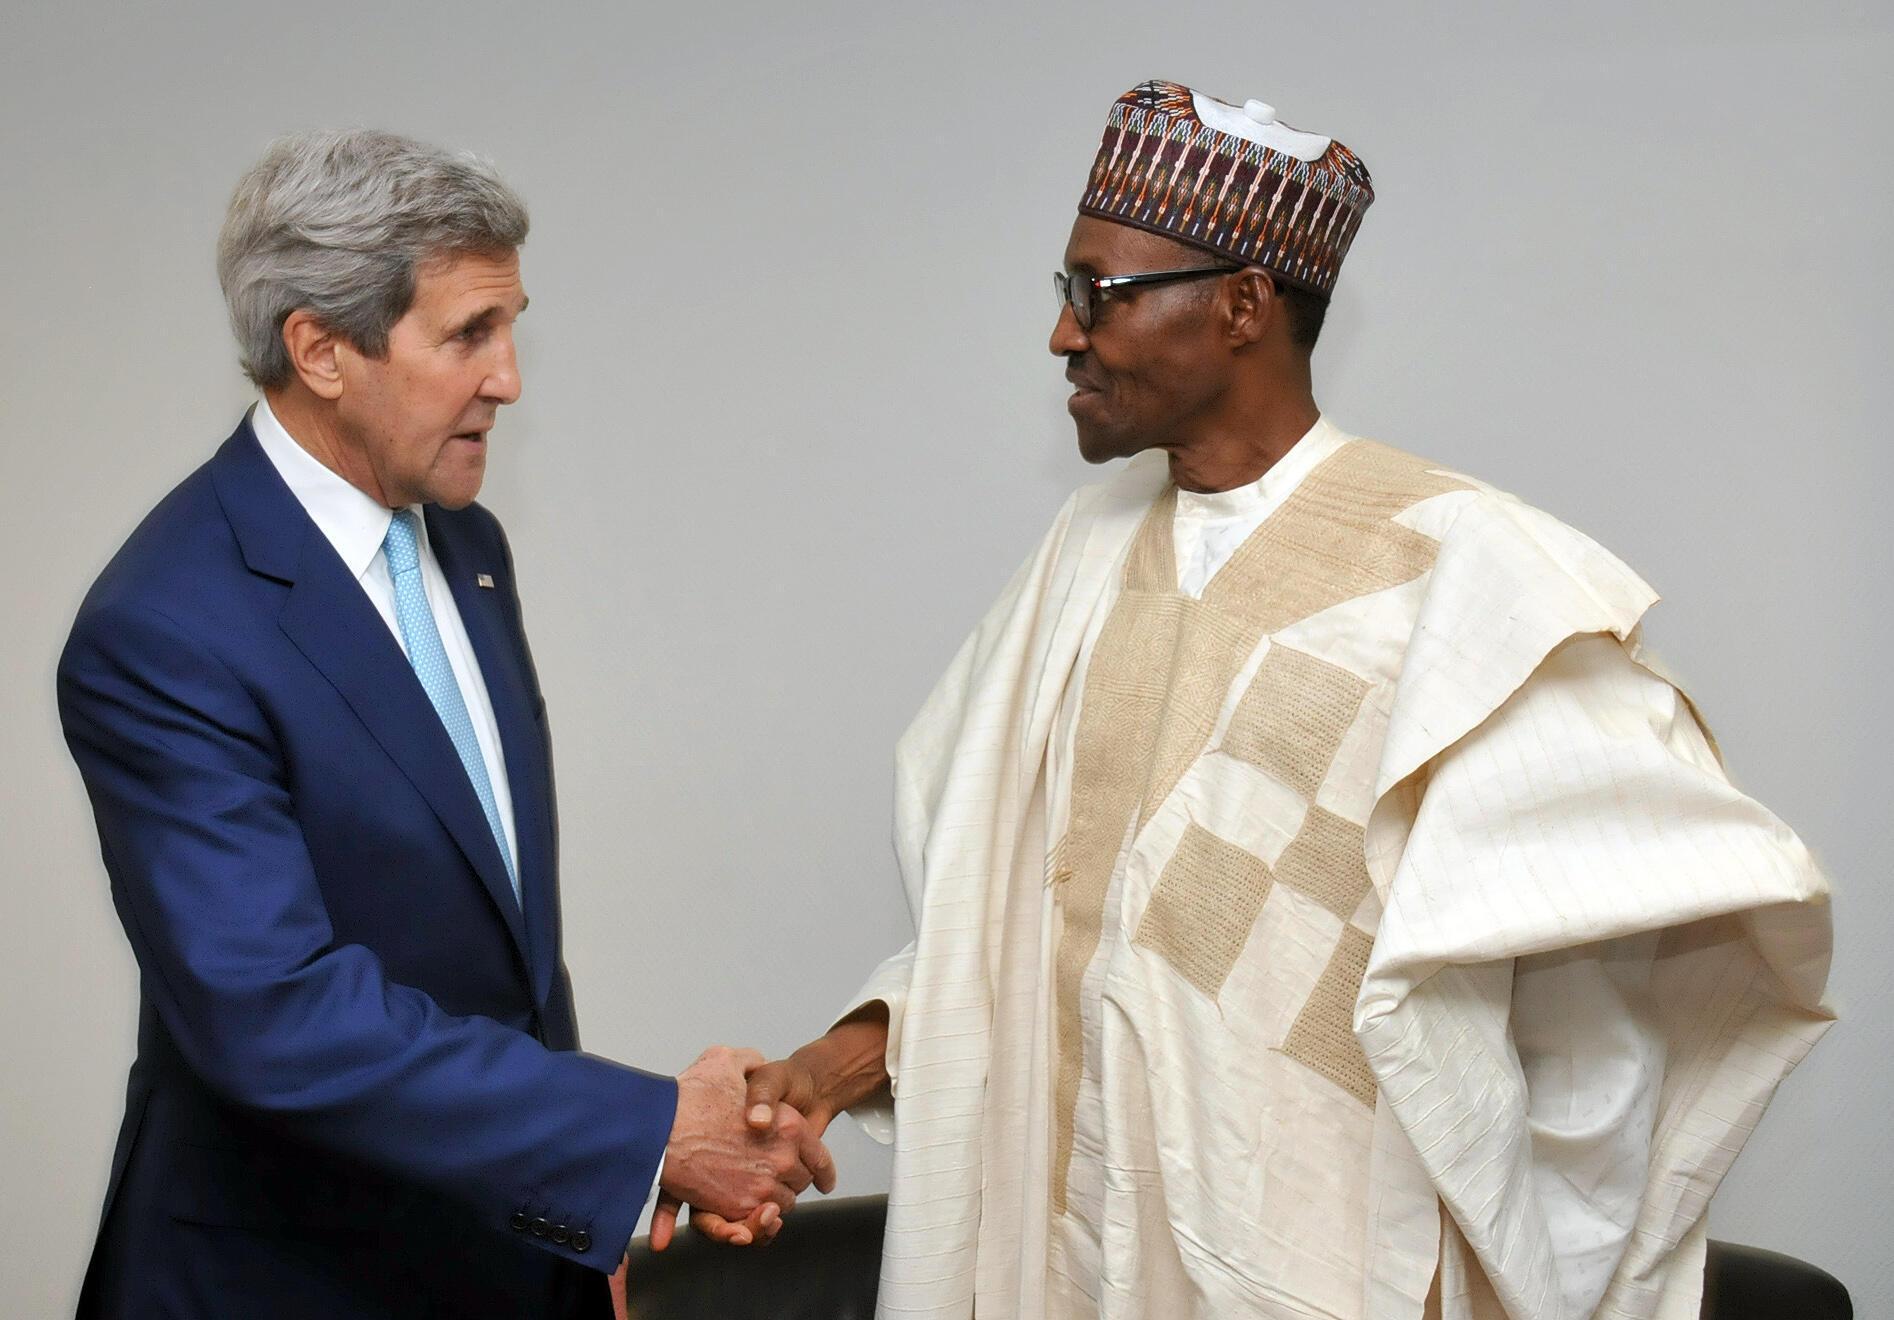 Le secrétaire d'Etat américain John Kerry  et le président nigérian Muhammadu Buhari.